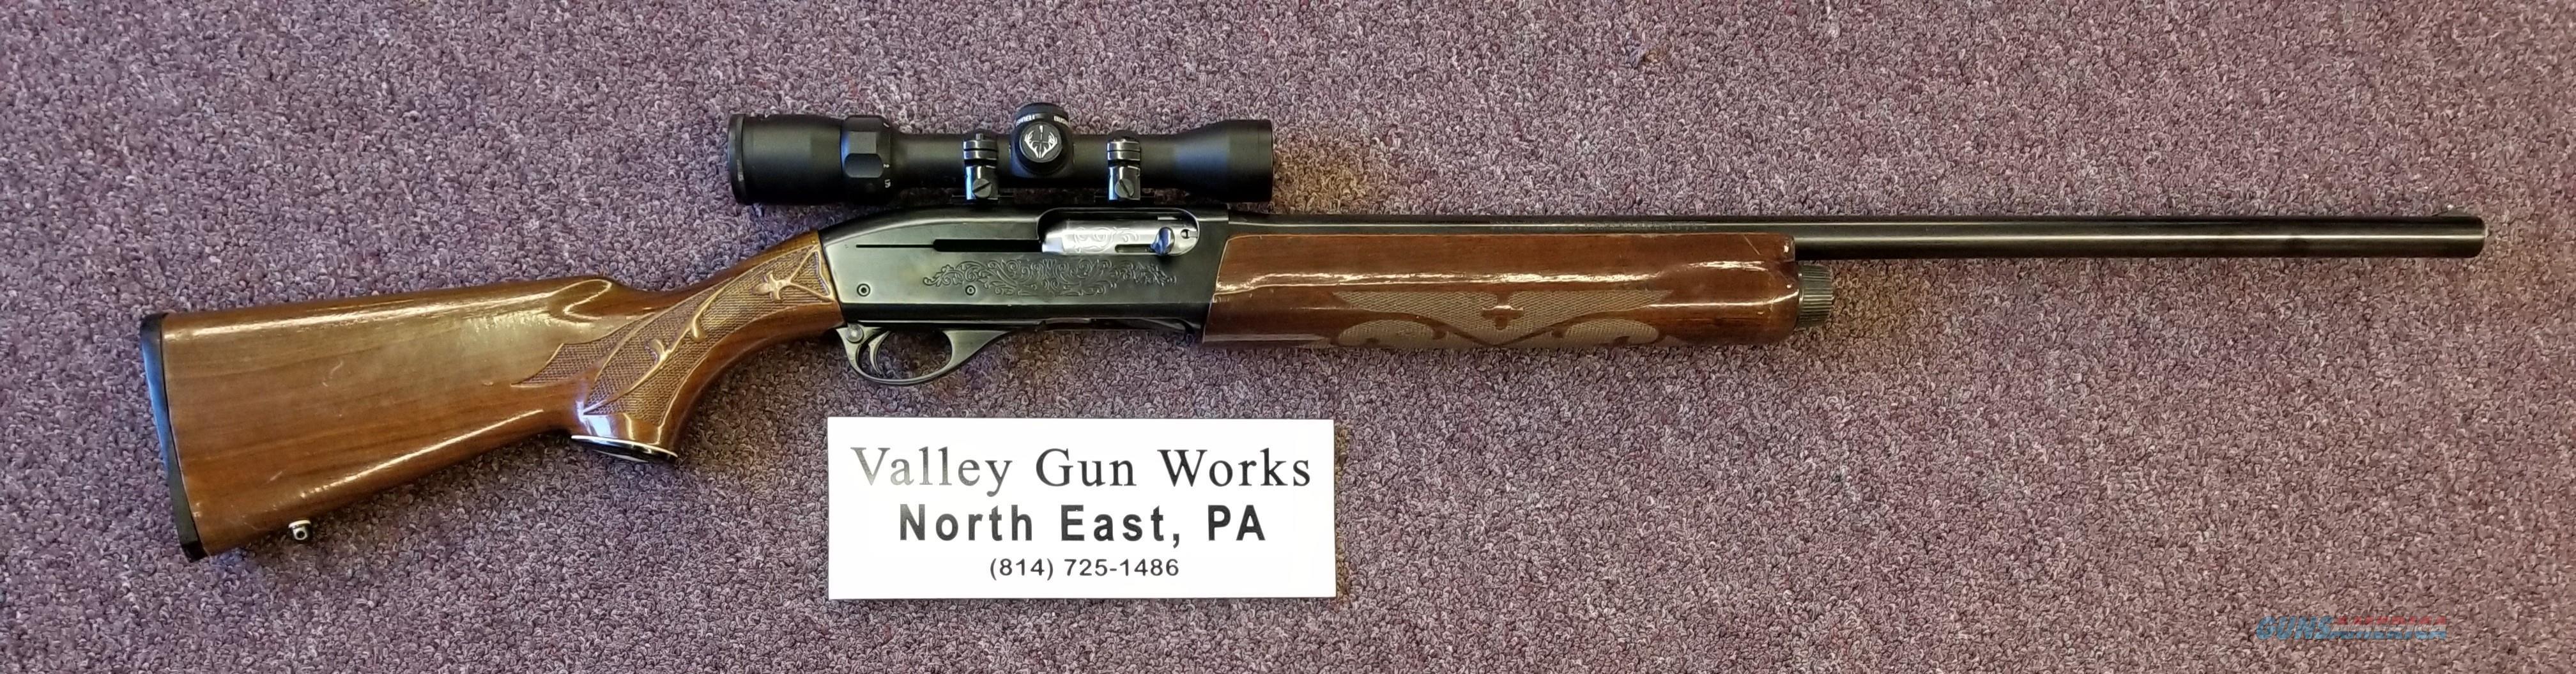 Remington 1100 - 12 Gauge Semi Auto - Slug Gun - Optics - Free Shipping  Guns > Shotguns > Remington Shotguns  > Autoloaders > Hunting